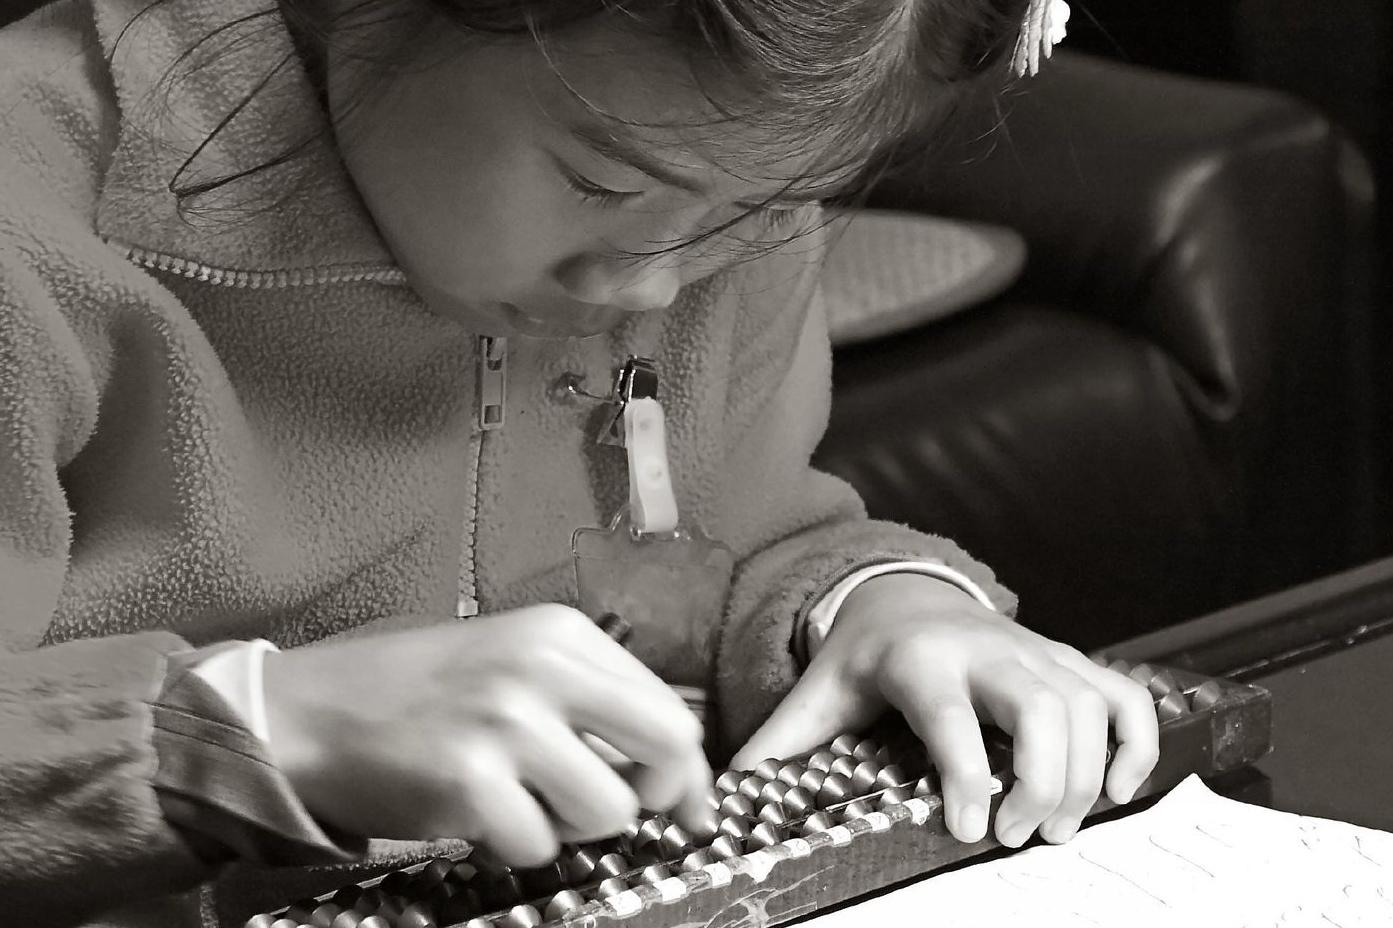 abacus little girl